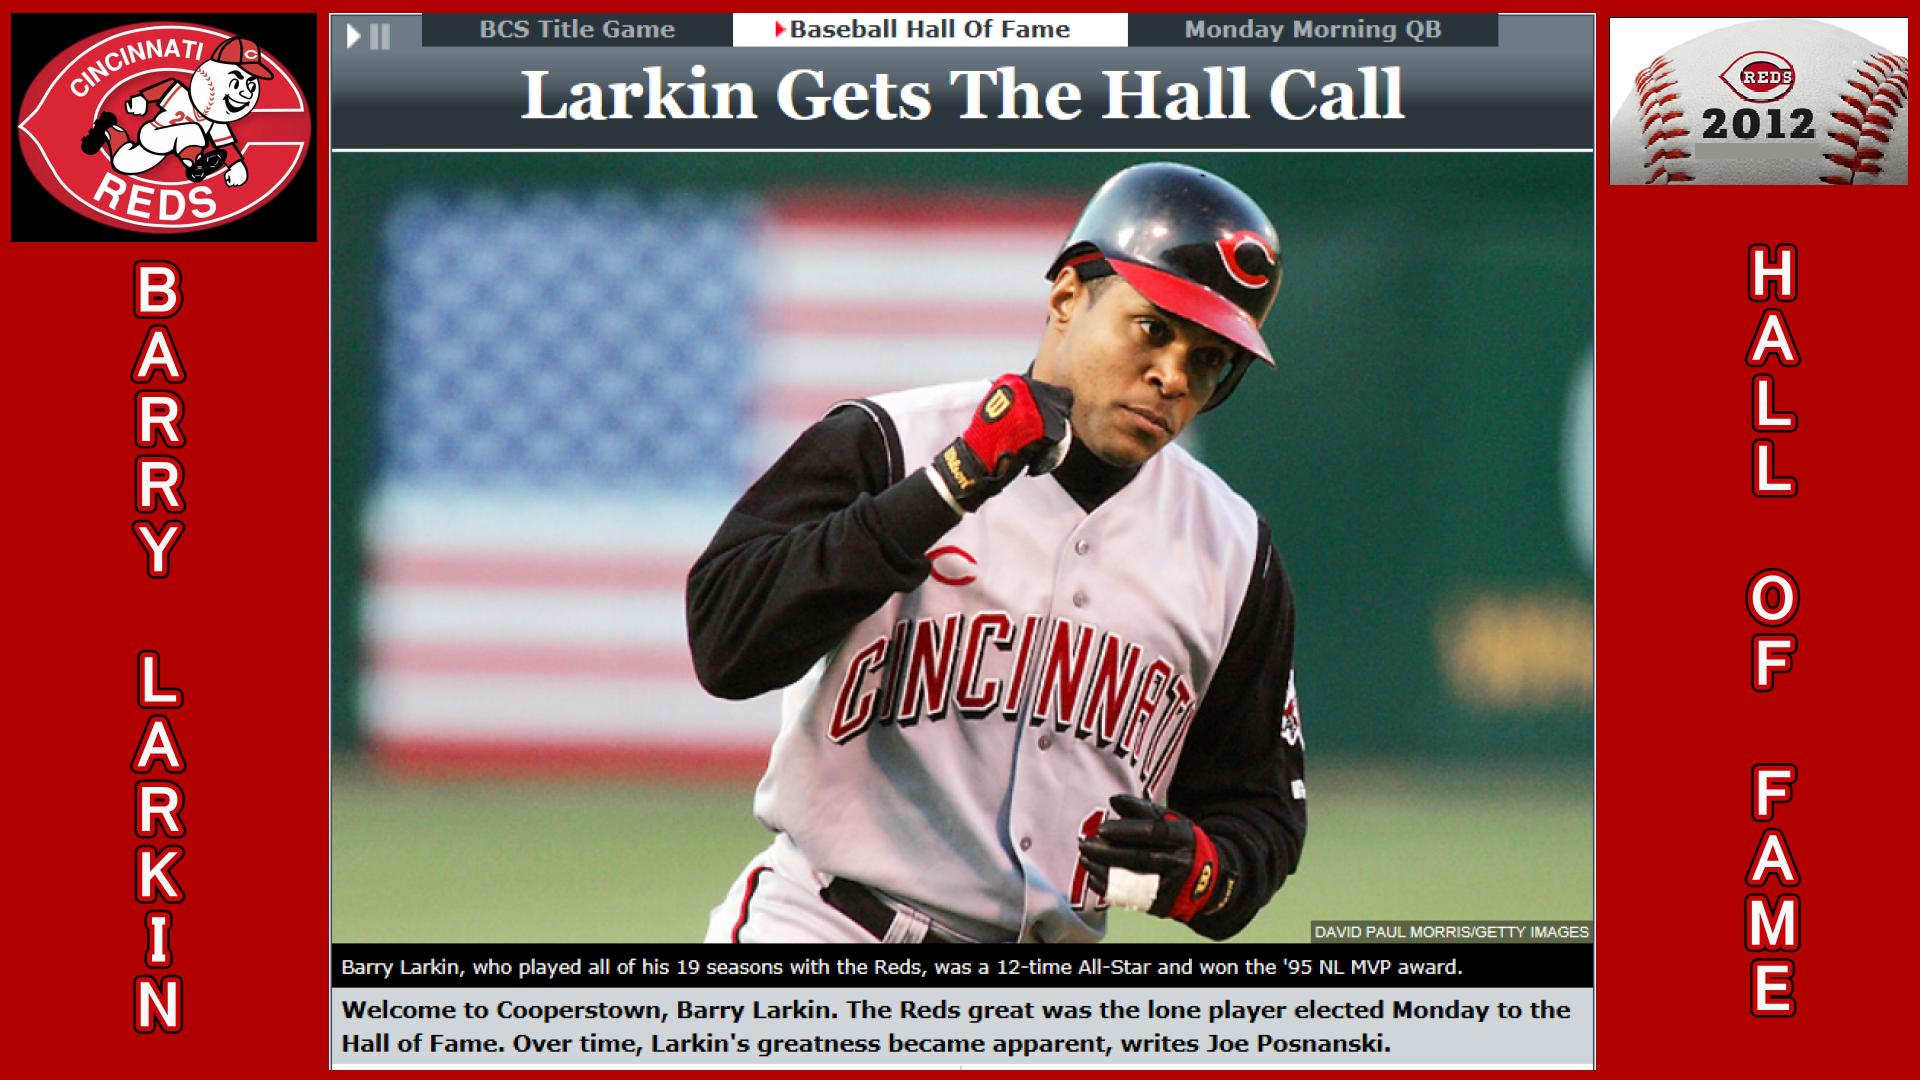 BARRY LARKIN 2012 BASEBALL HOF